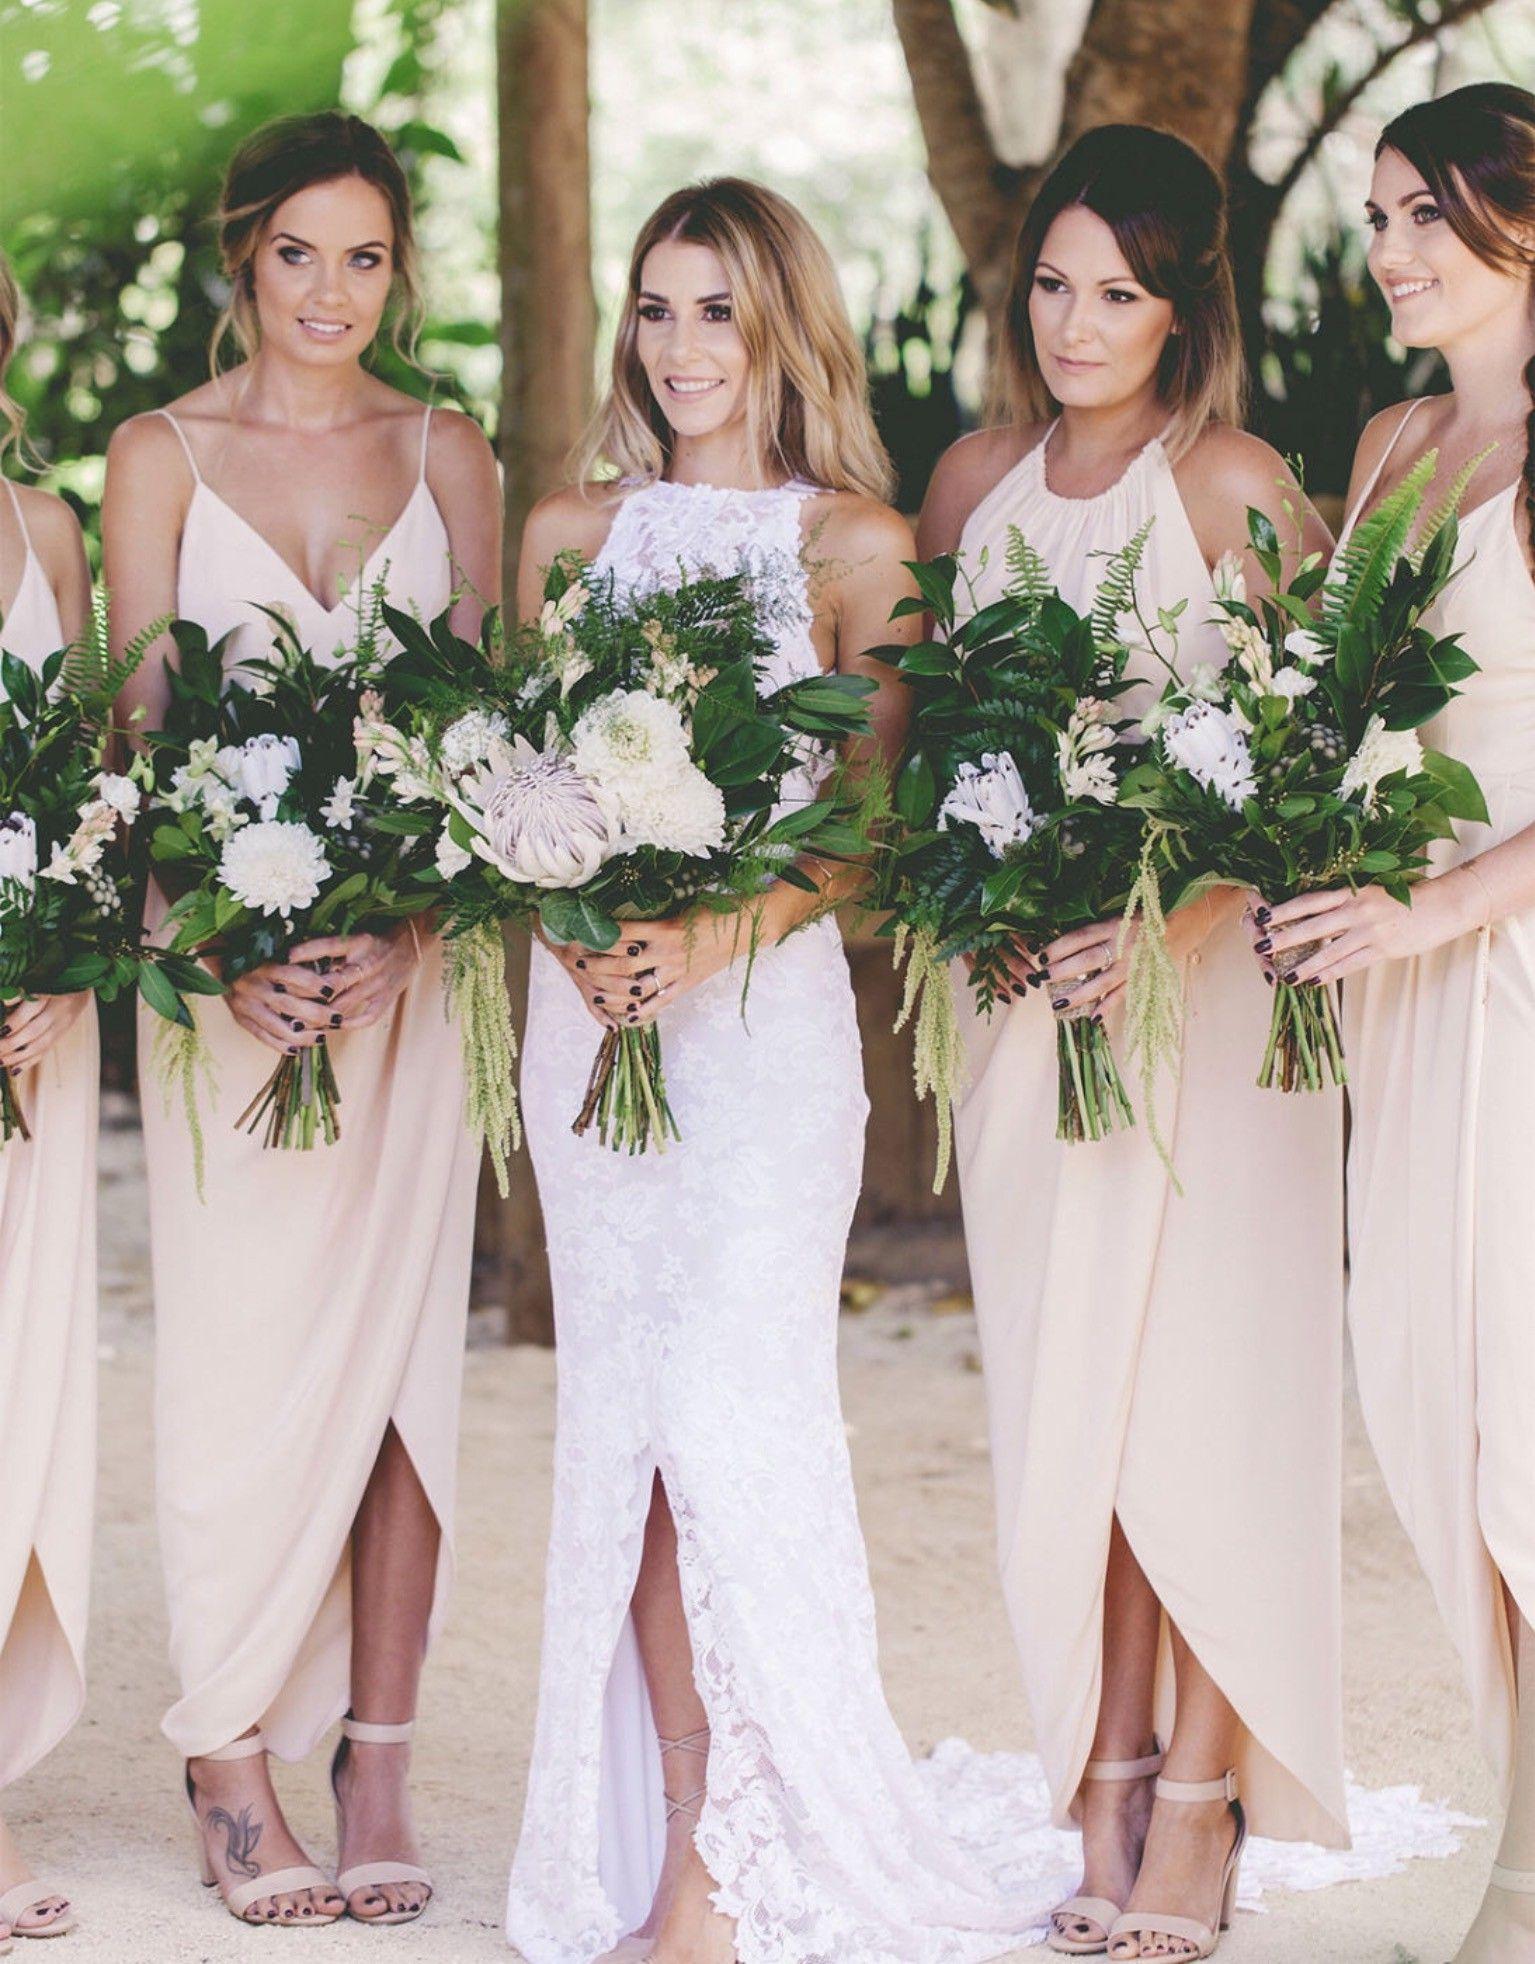 Grace loves lace alexandra second hand wedding dress on sale 29 grace loves lace alexandra second hand wedding dress on sale 29 off ombrellifo Gallery